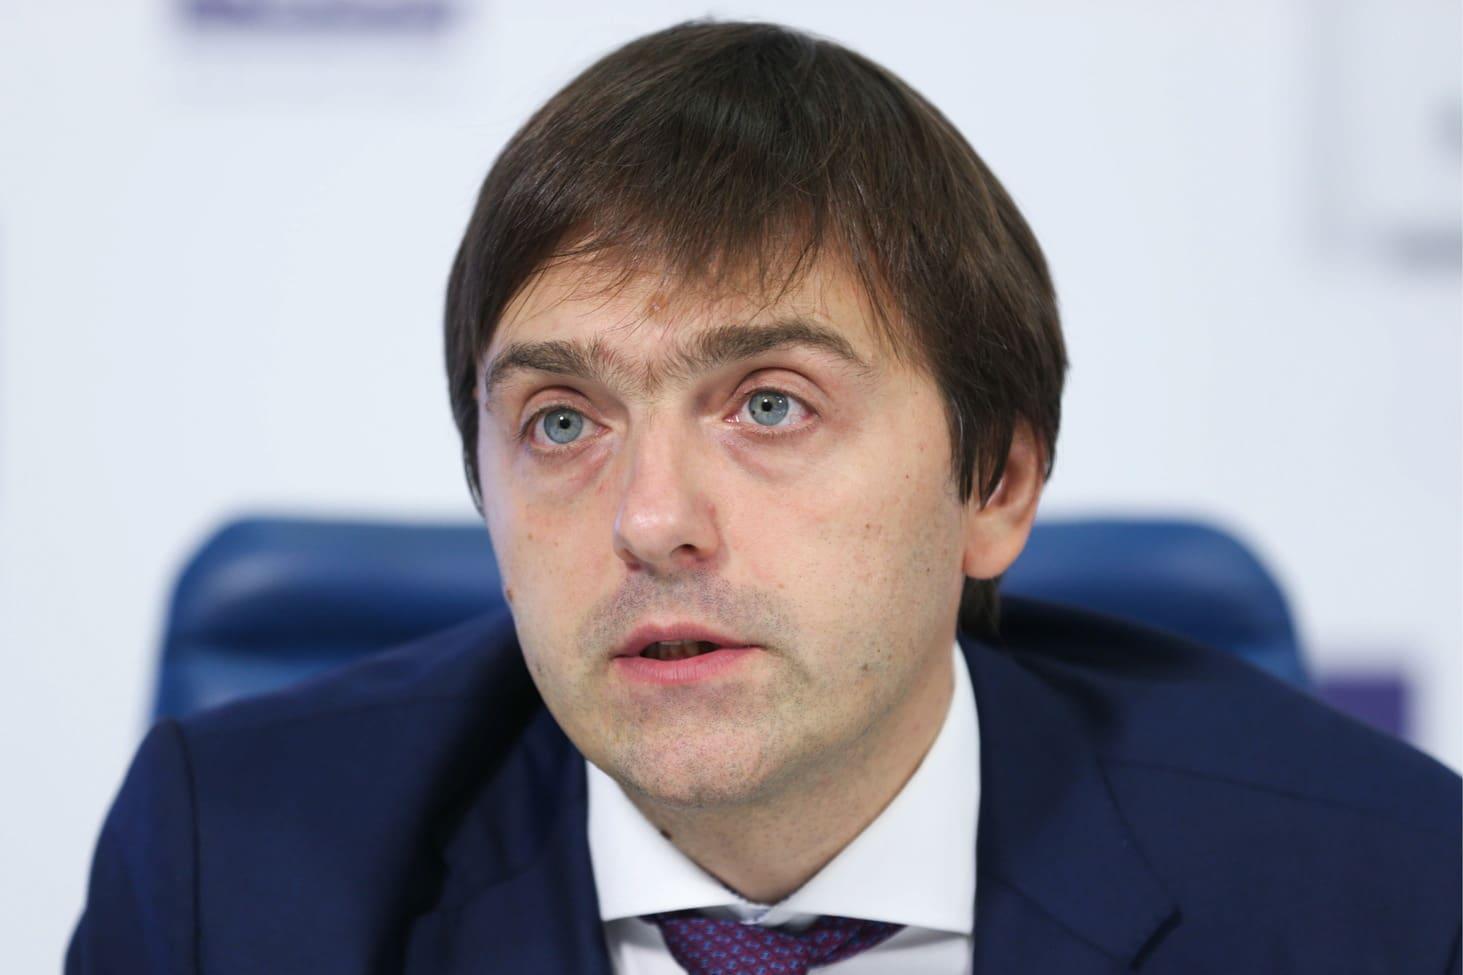 dmitrij-gushhin-posovetoval-sergeyu-kravtsovu-najti-pravilnye-slova-po-povodu-utechki-zadanij-ege